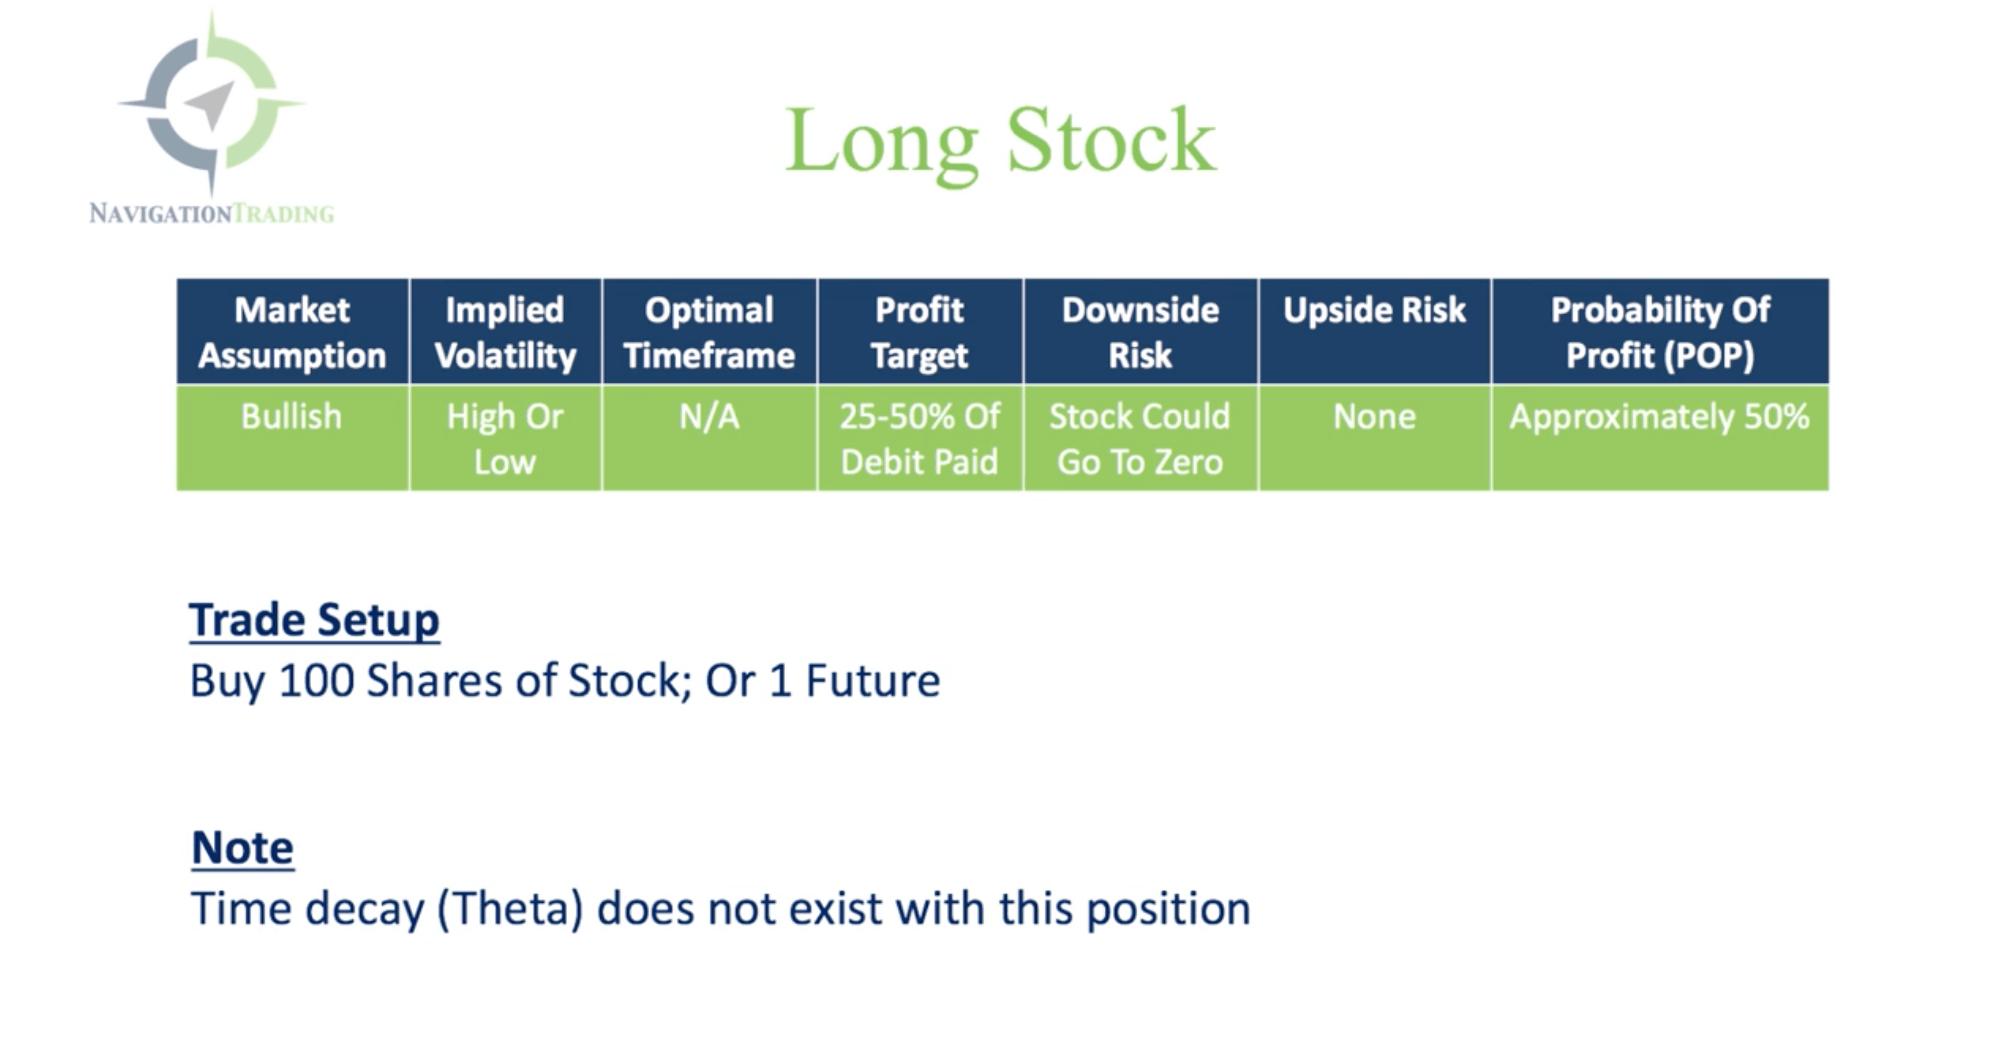 Long Stock Specs